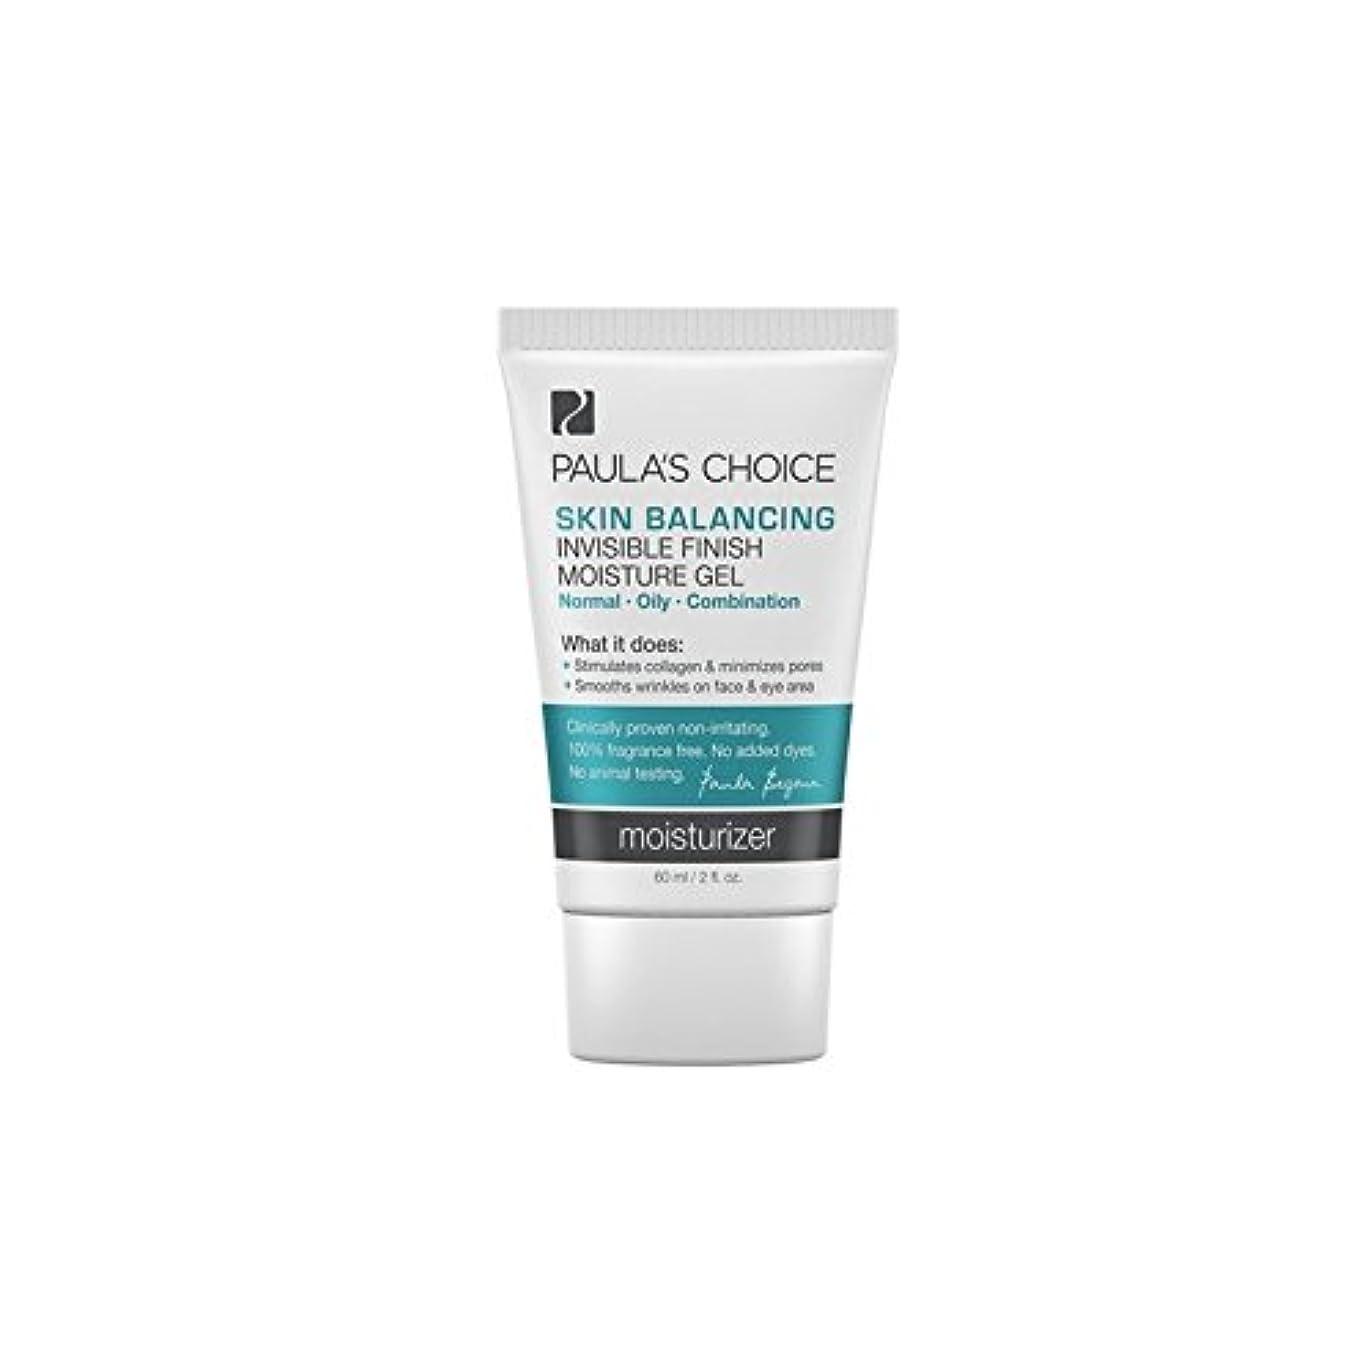 Paula's Choice Skin Balancing Invisible Finish Moisture Gel (60ml) (Pack of 6) - ポーラチョイスの肌のバランス目に見えない仕上がり水分ゲル(60ミリリットル) x6 [並行輸入品]